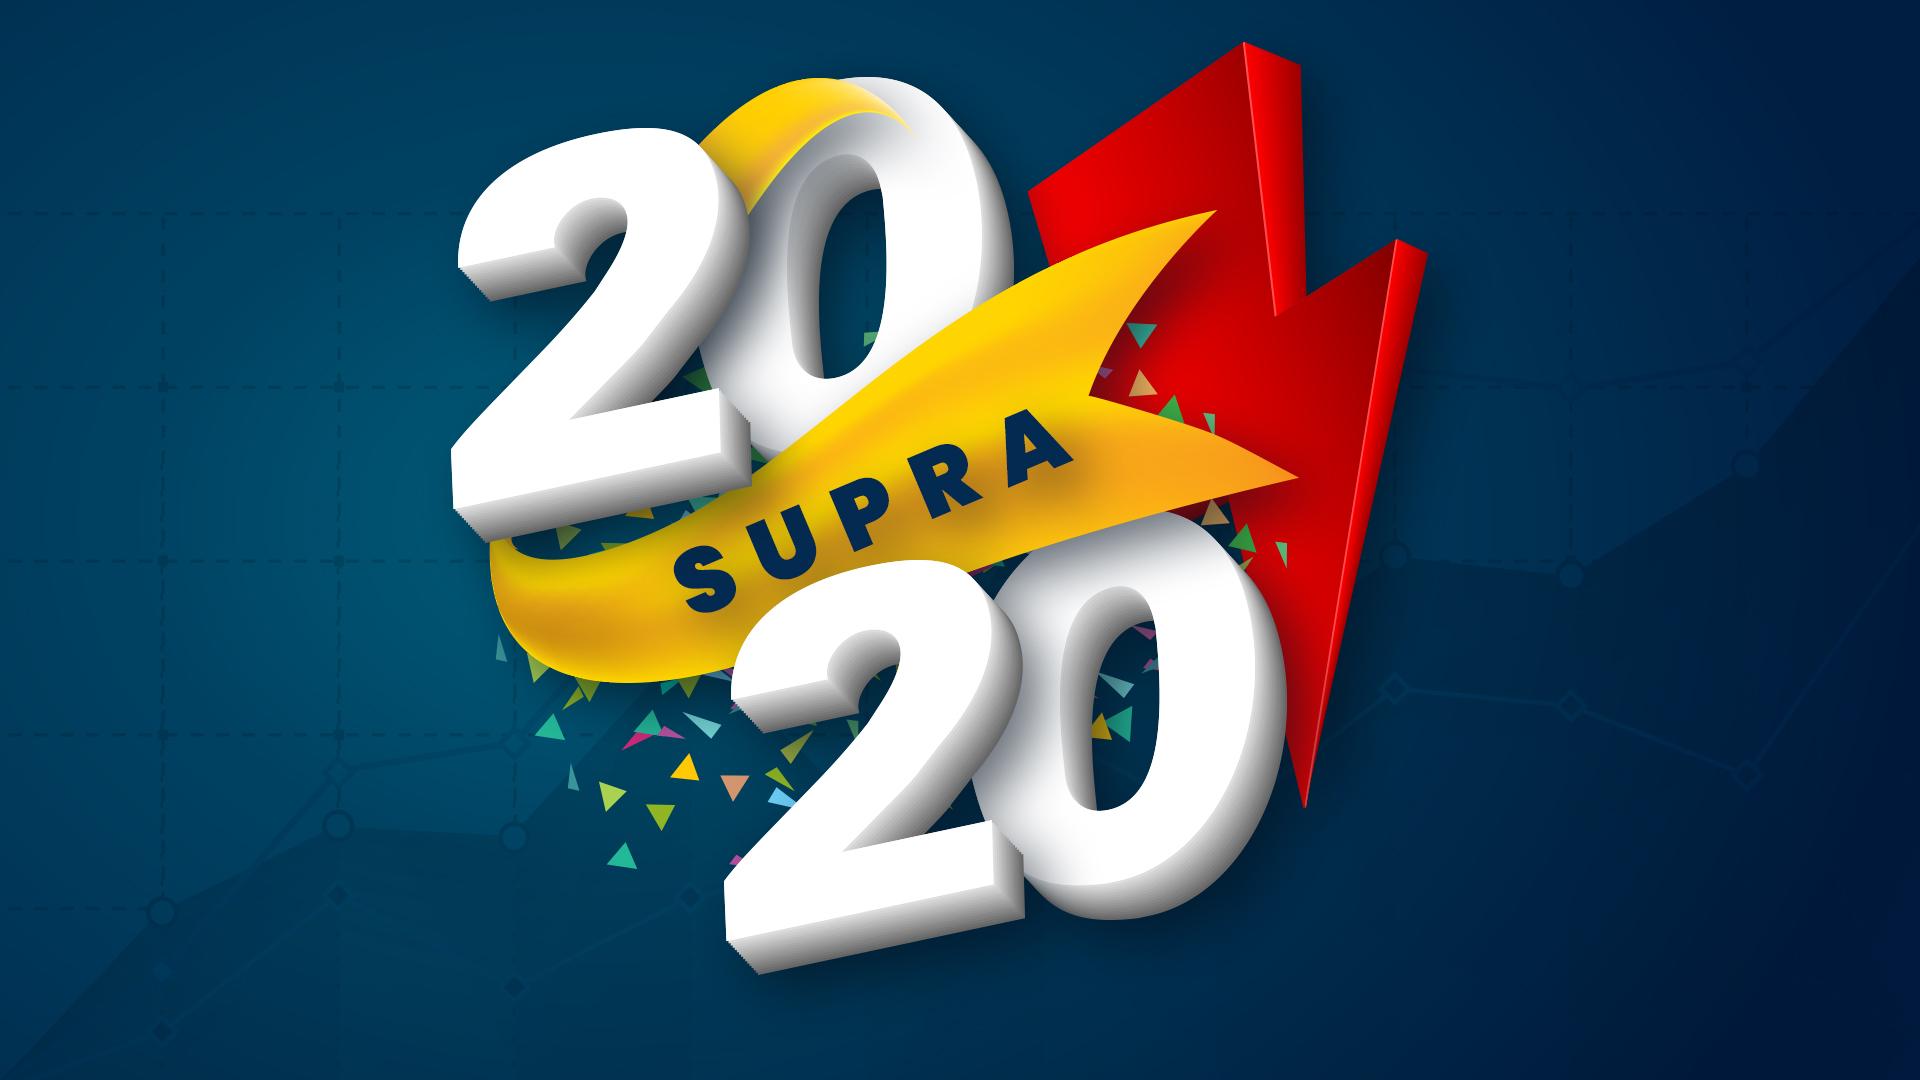 20 supra 20